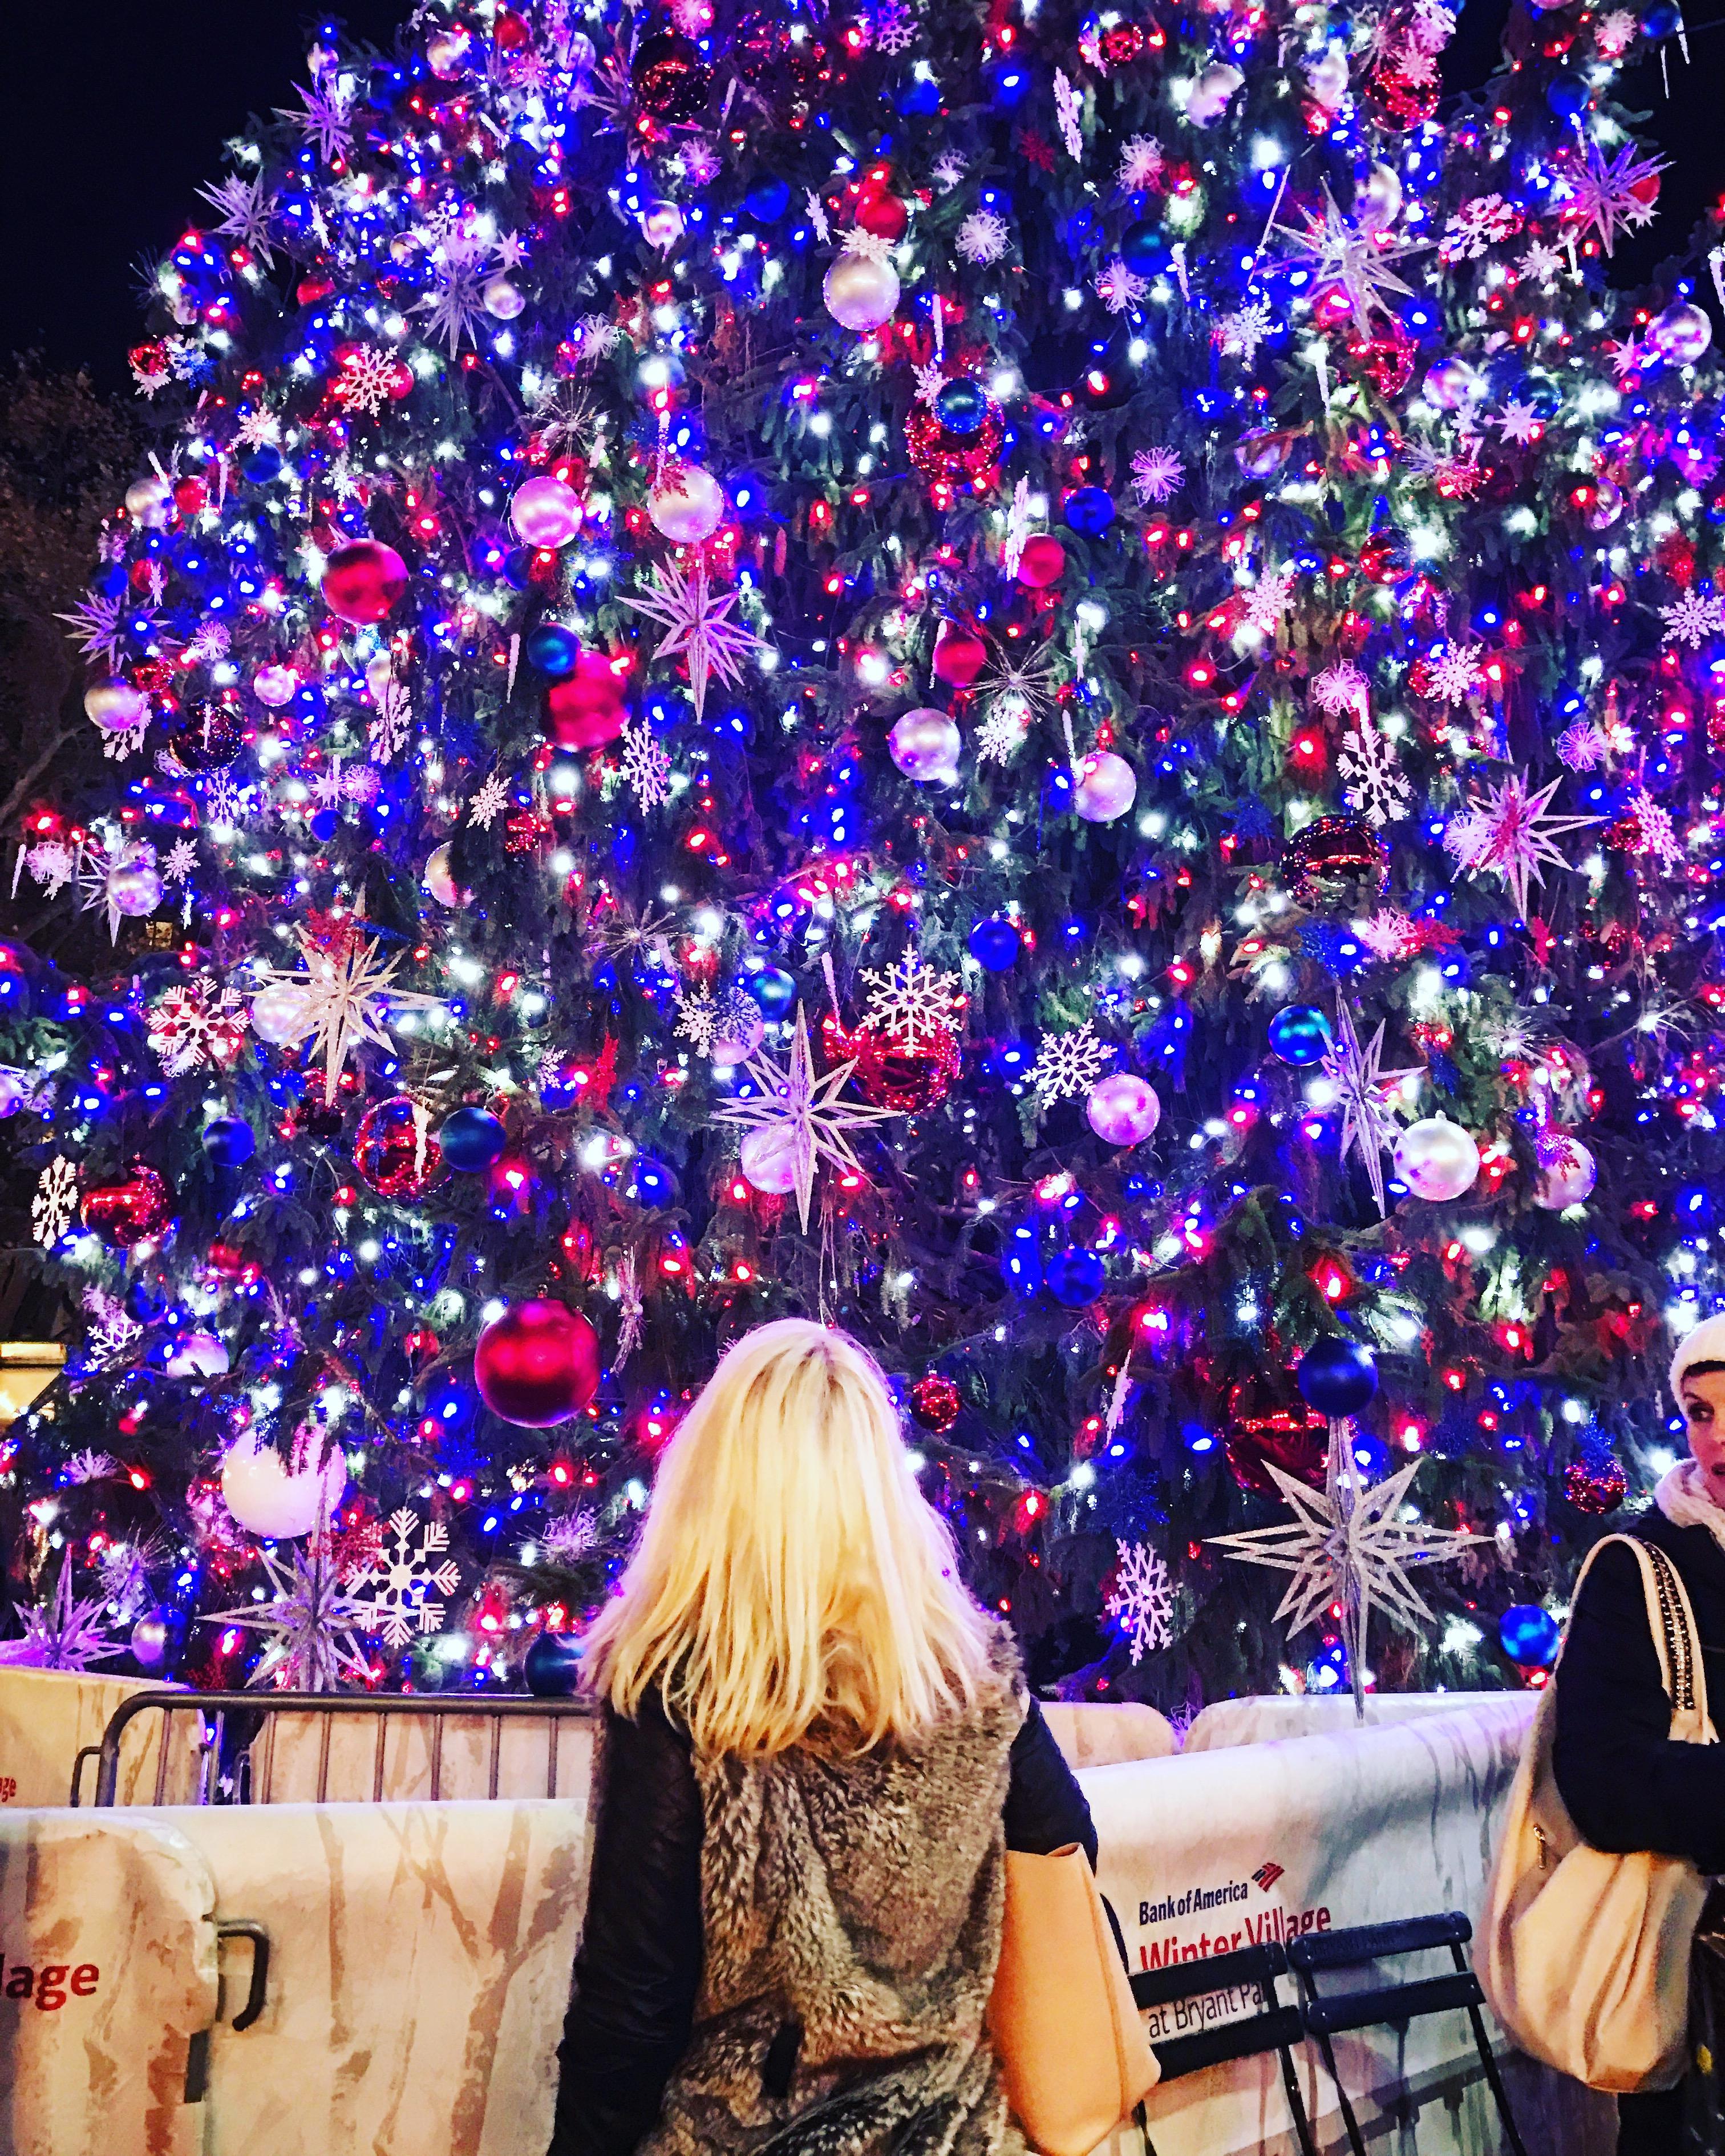 Winter at Bryant Park: The Tree Lighting